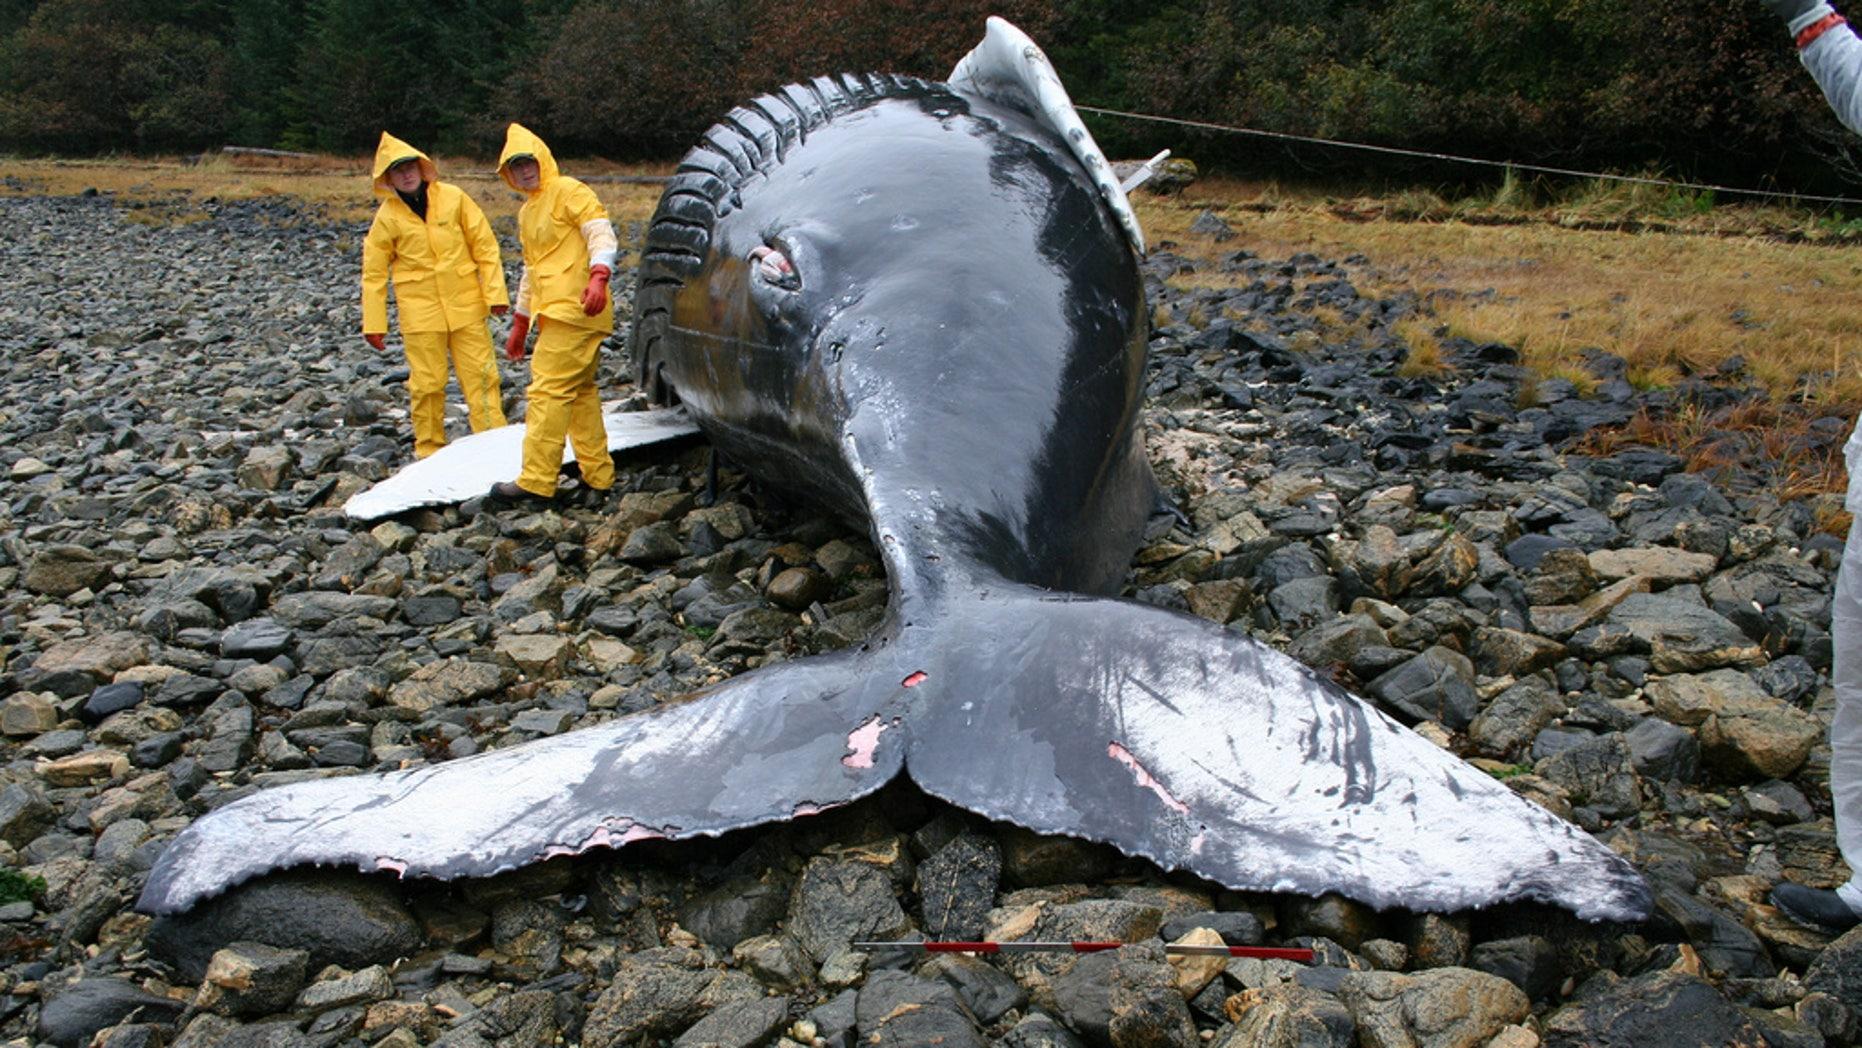 Veterinarians assist during the necropsy of a humpback whale calf that was stranded on Baranof Island, Alaska. (Alicia Jensen/NOAA/NMFS/AKFSC via NASA)